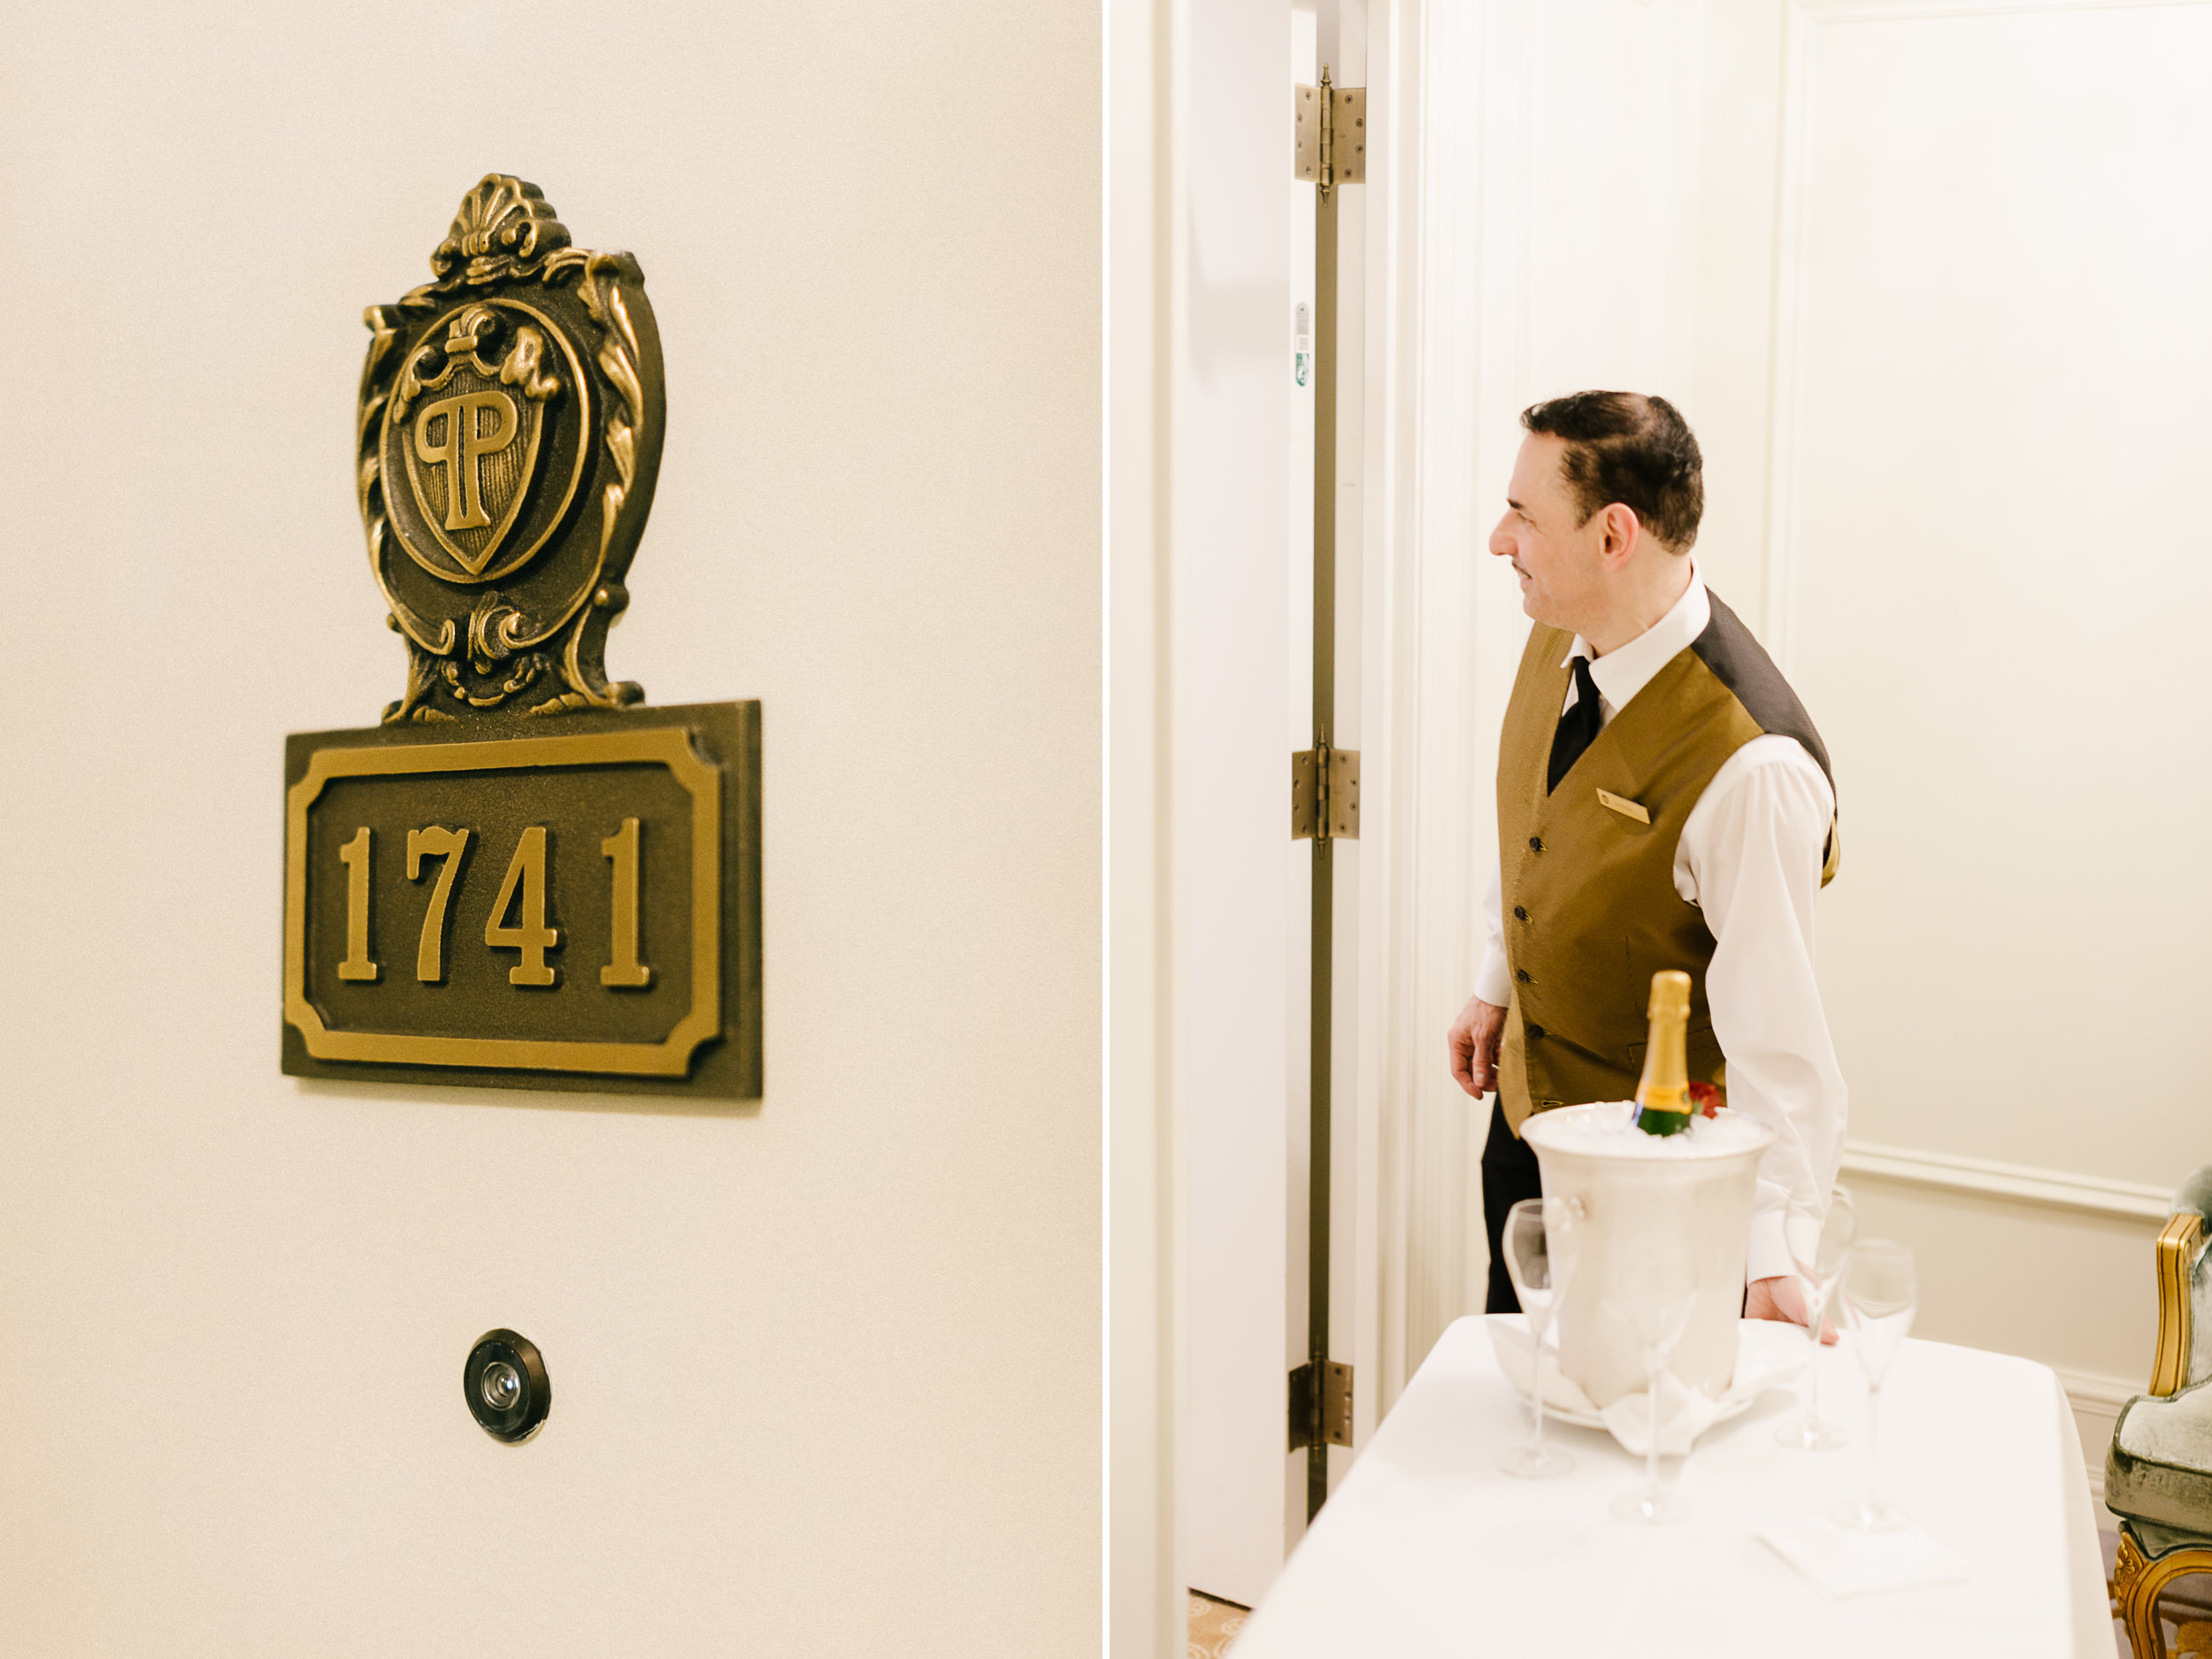 Plaza-hotel-central-park-wedding-A&M-1.jpg